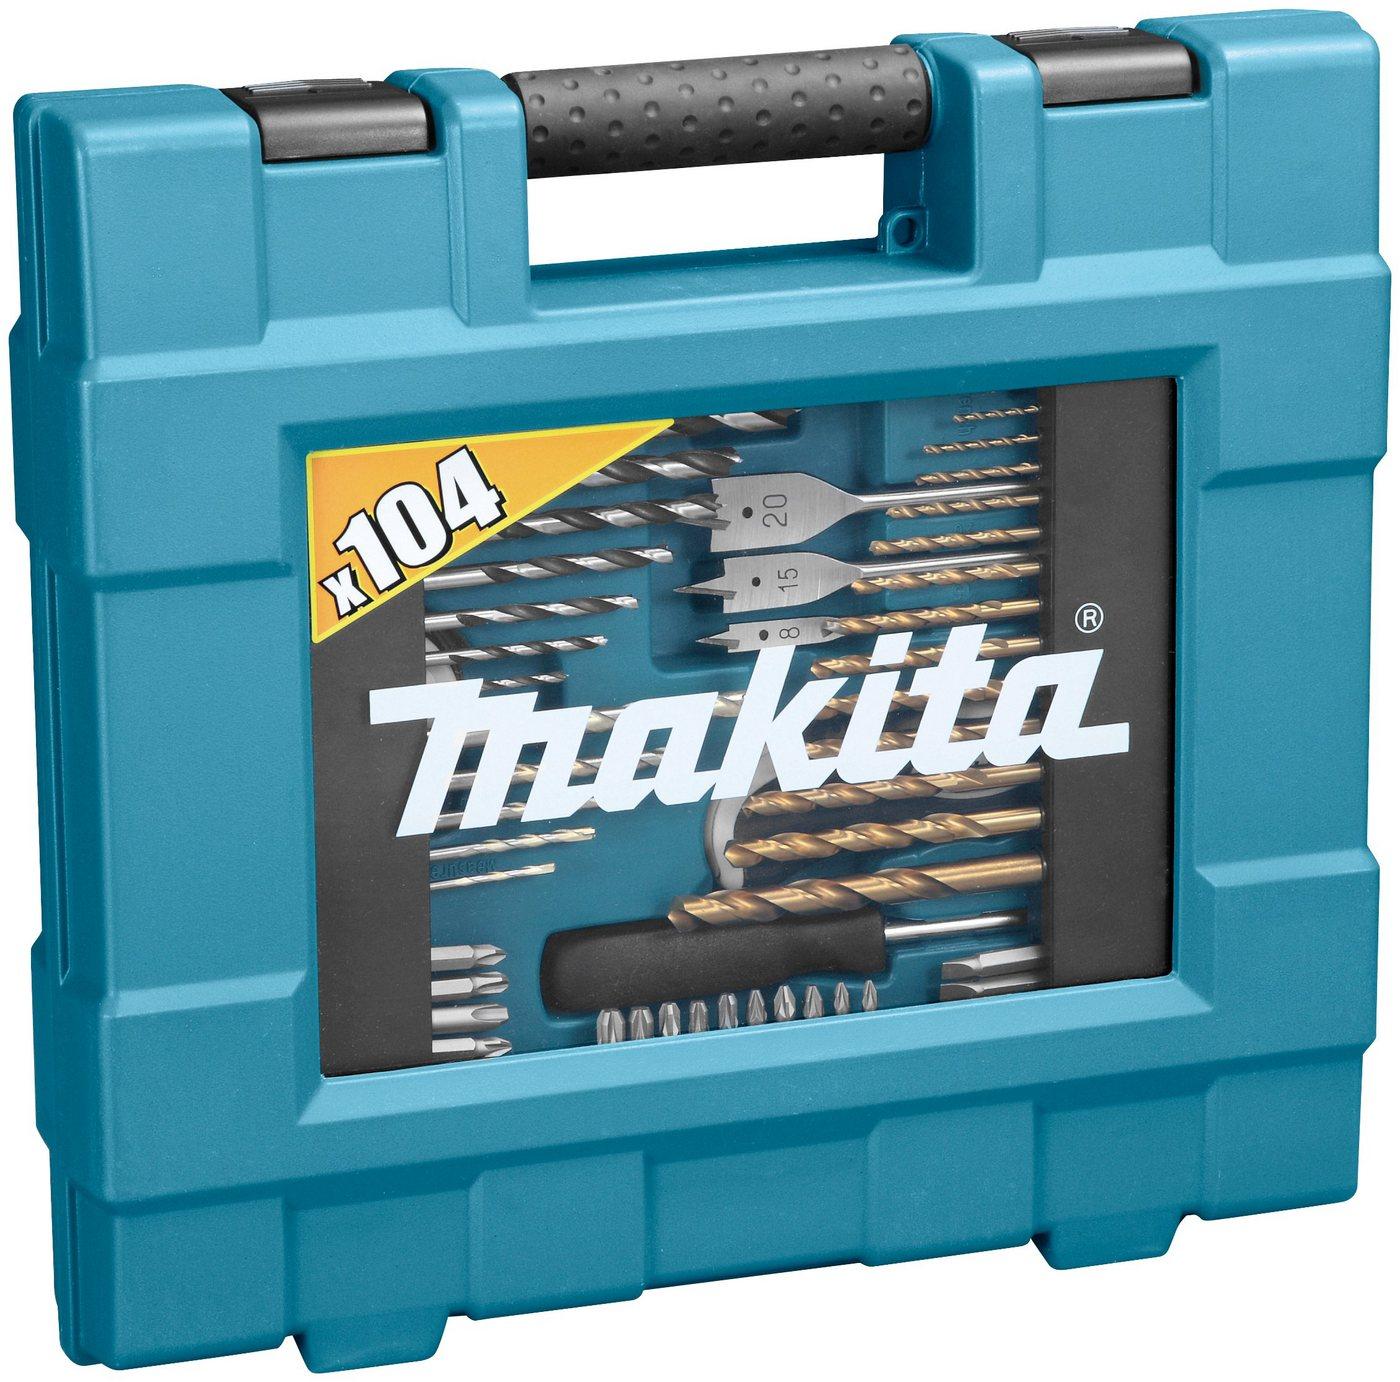 MAKITA Bohrer-Bit-Set »D-31778«, (104-tlg.)   Baumarkt > Werkzeug > Werkzeug-Sets   Blau   Makita